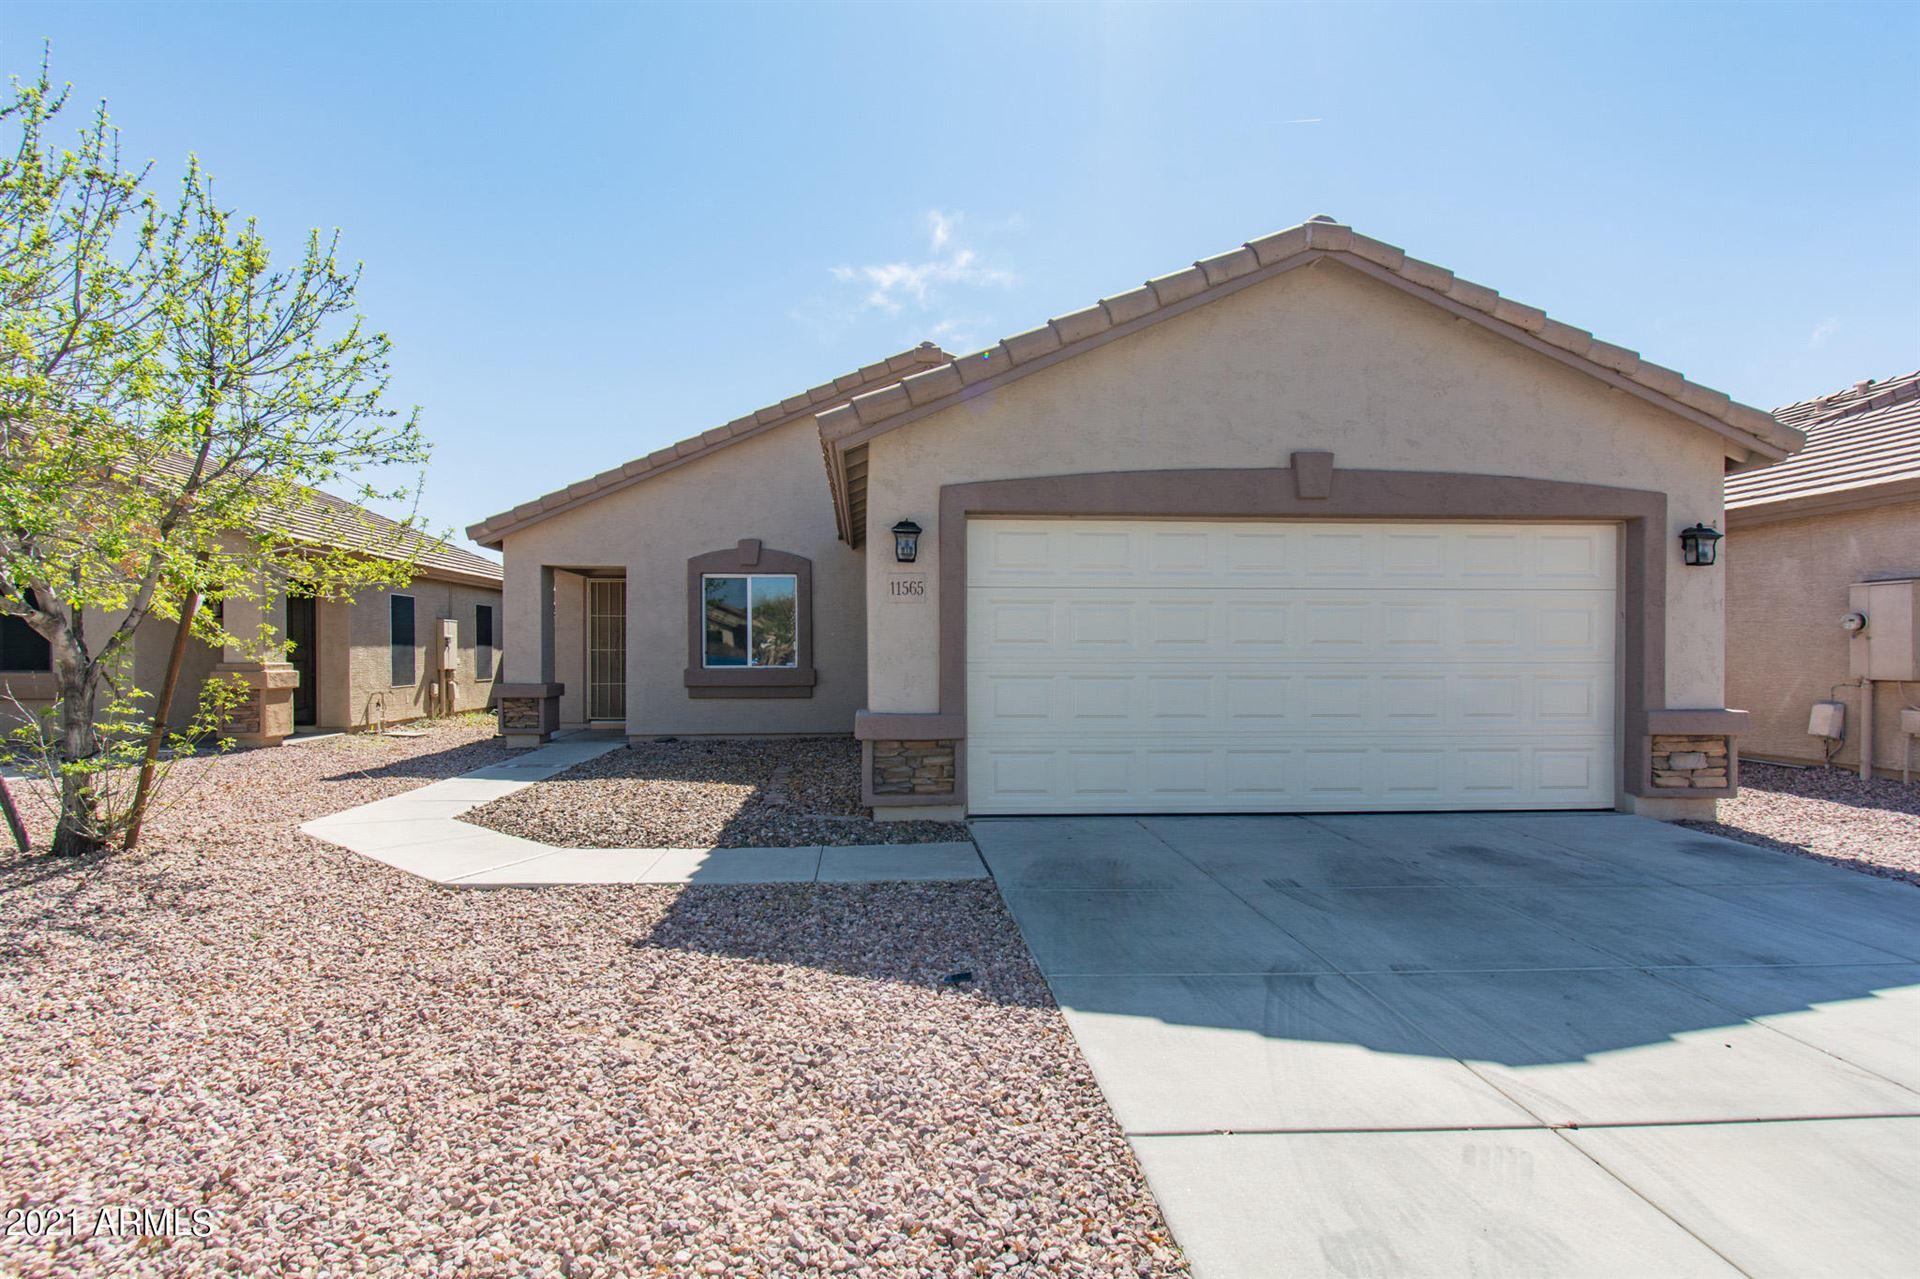 Photo of 11565 W CAROL Avenue, Youngtown, AZ 85363 (MLS # 6201999)